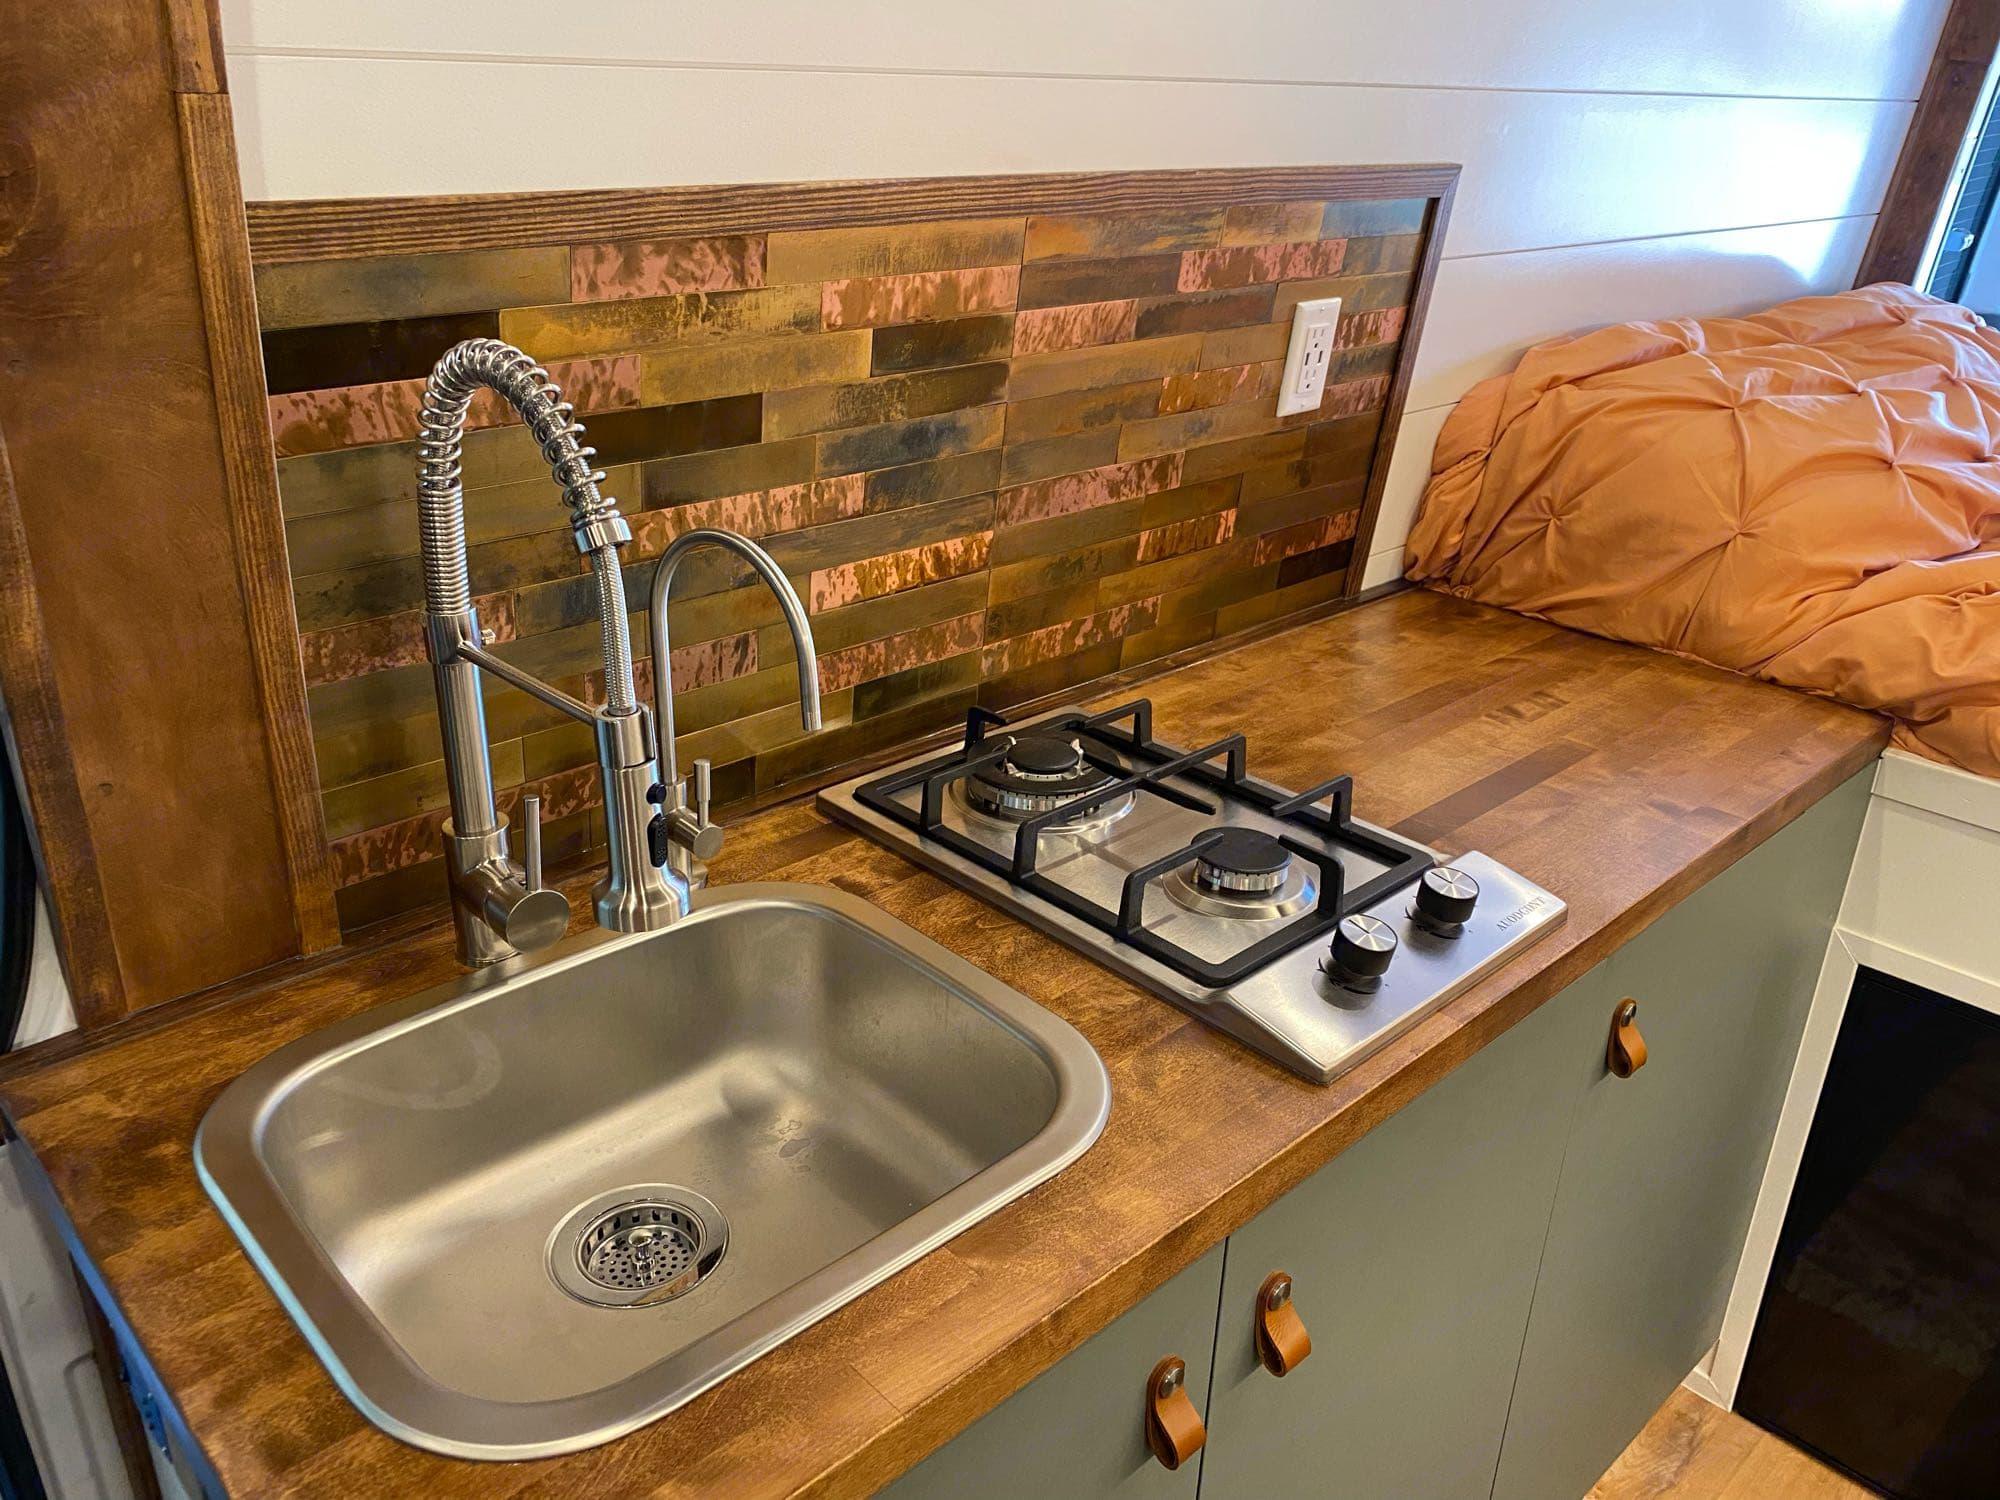 Butcher block counter top, copper back splash. Mercedes-Benz Sprinter 2019